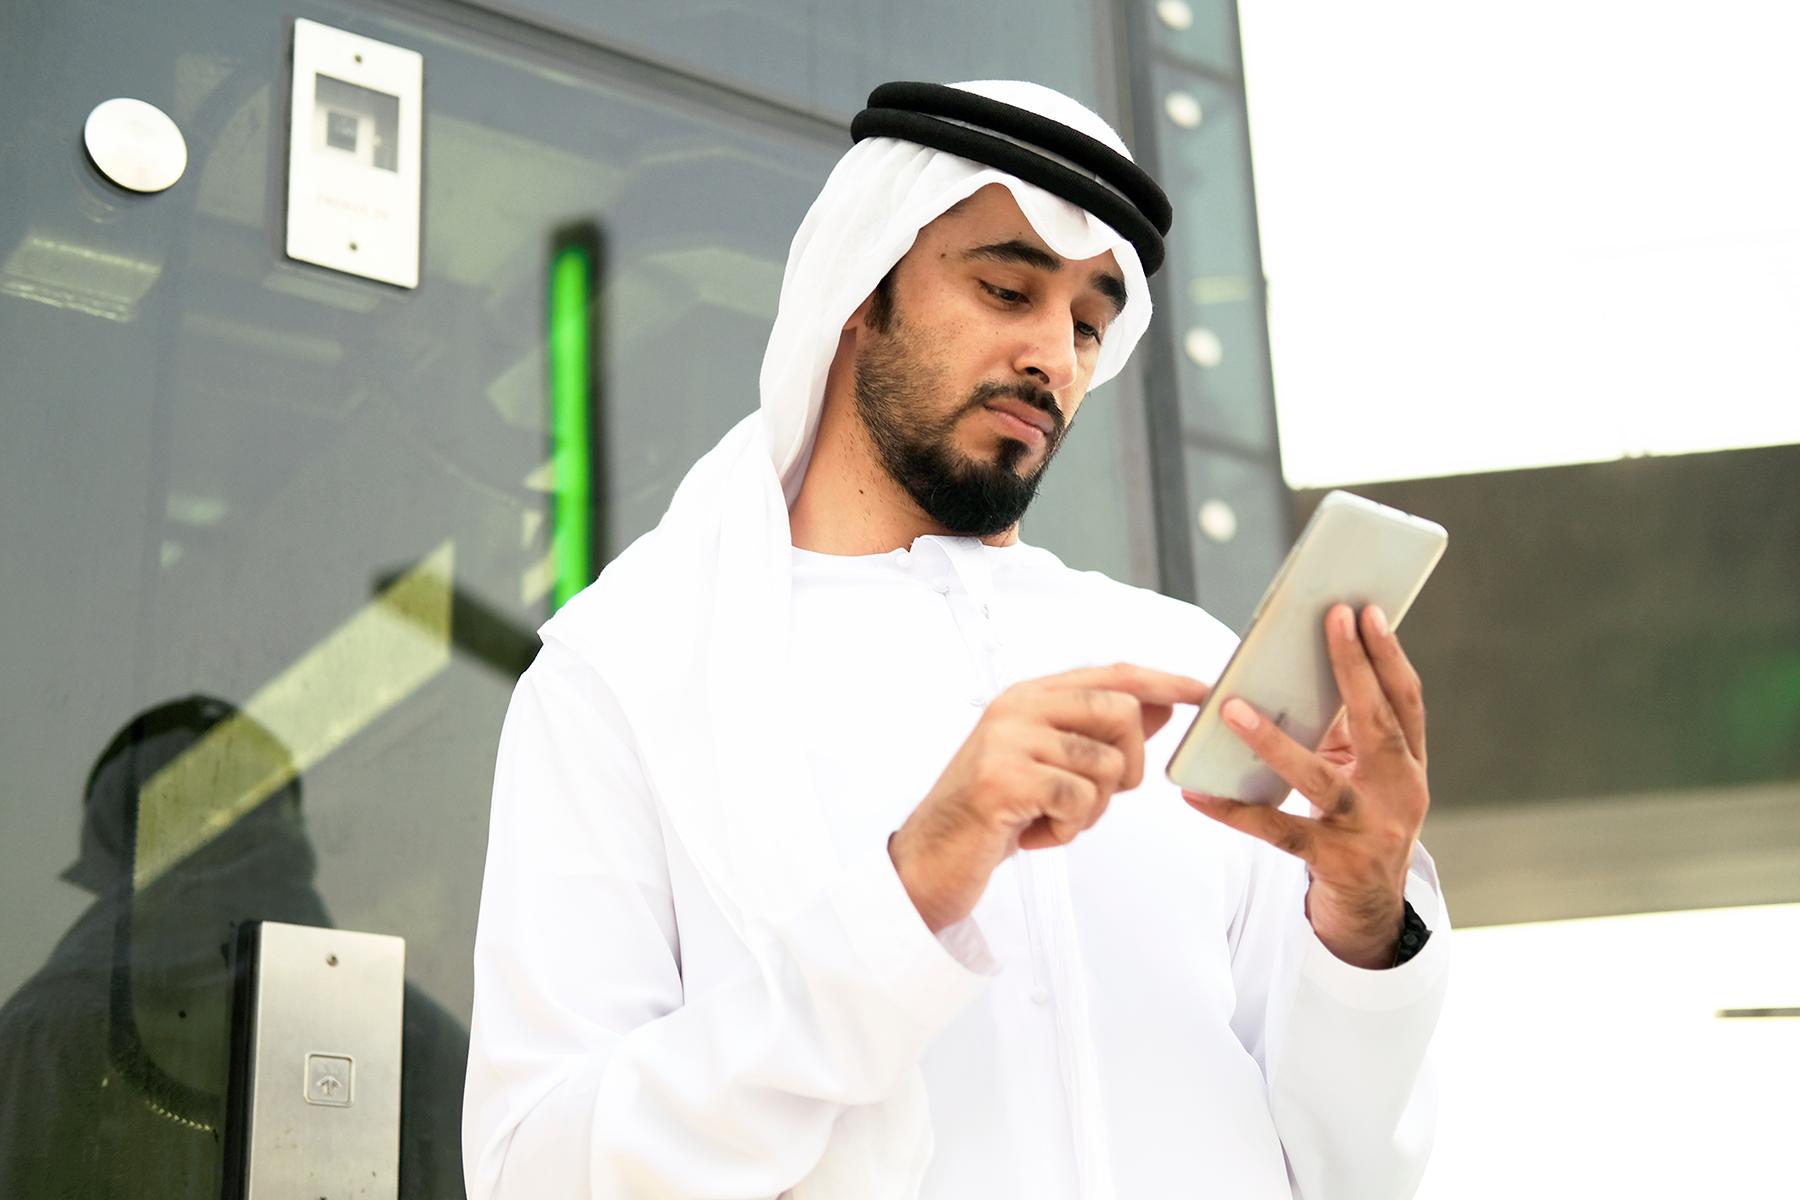 Qatari man using his mobile phone